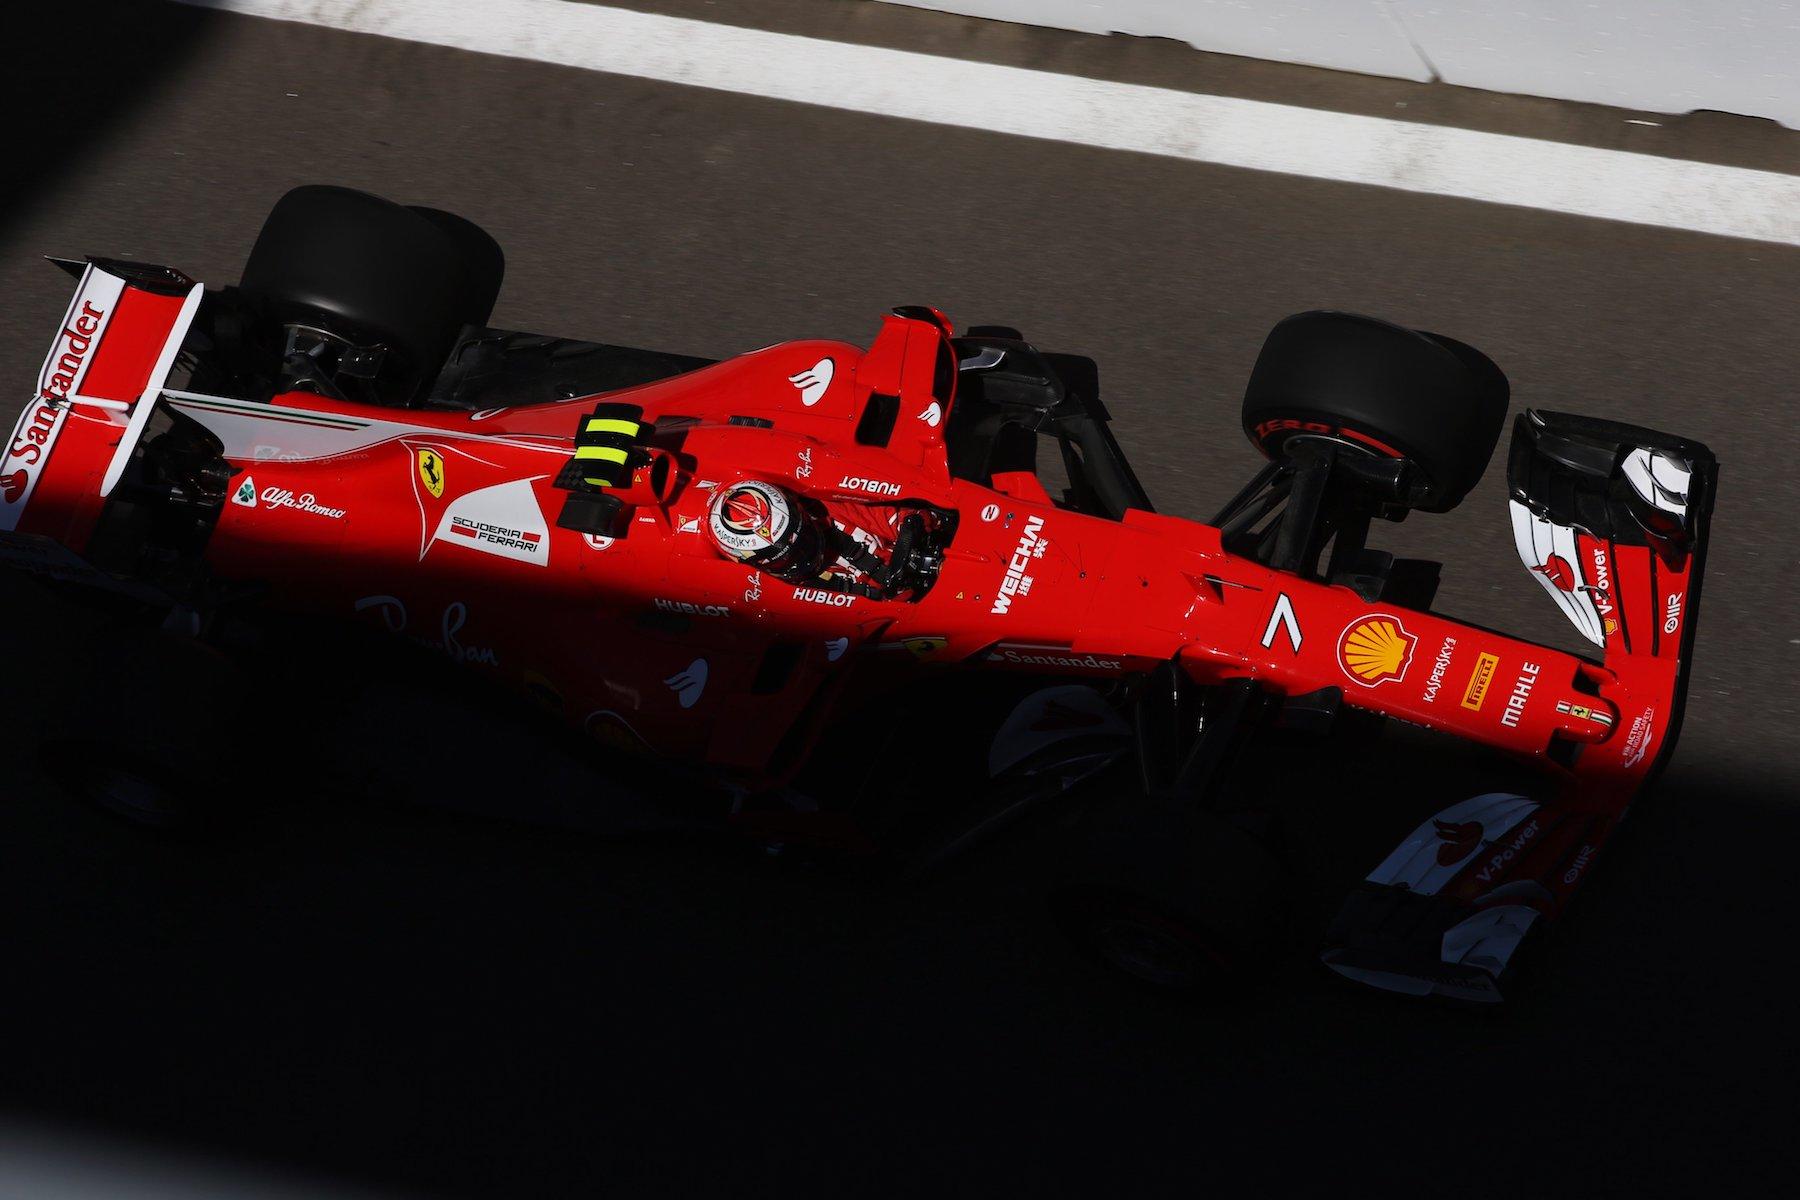 2017 Kimi Raikkonen | Ferrari SF70H | 2017 Russian GP FP1 4 copy.jpg